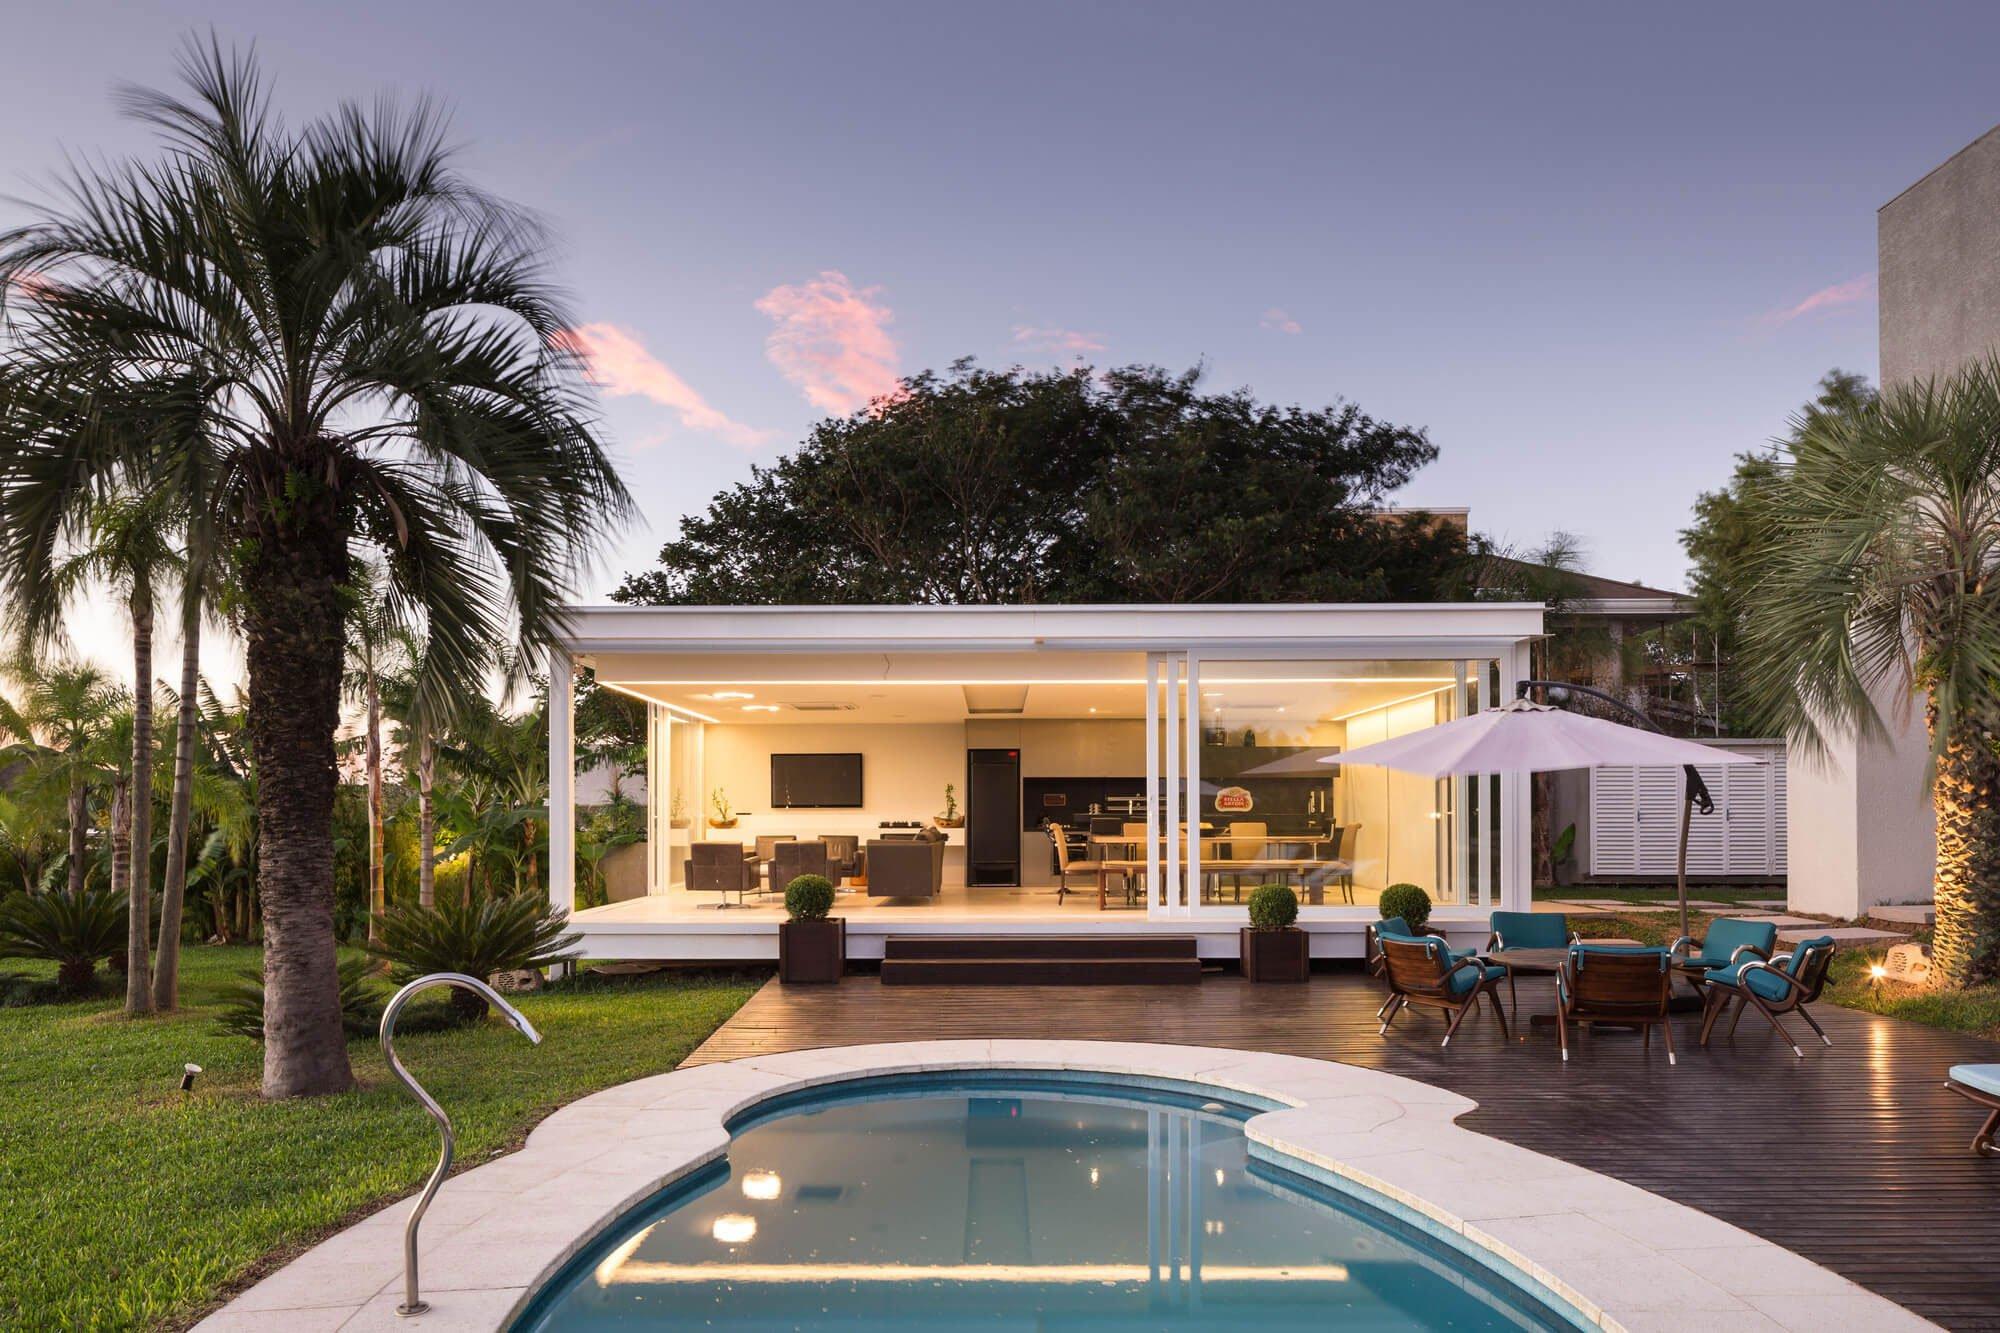 Pool-House-in-Porto-Alegre-23